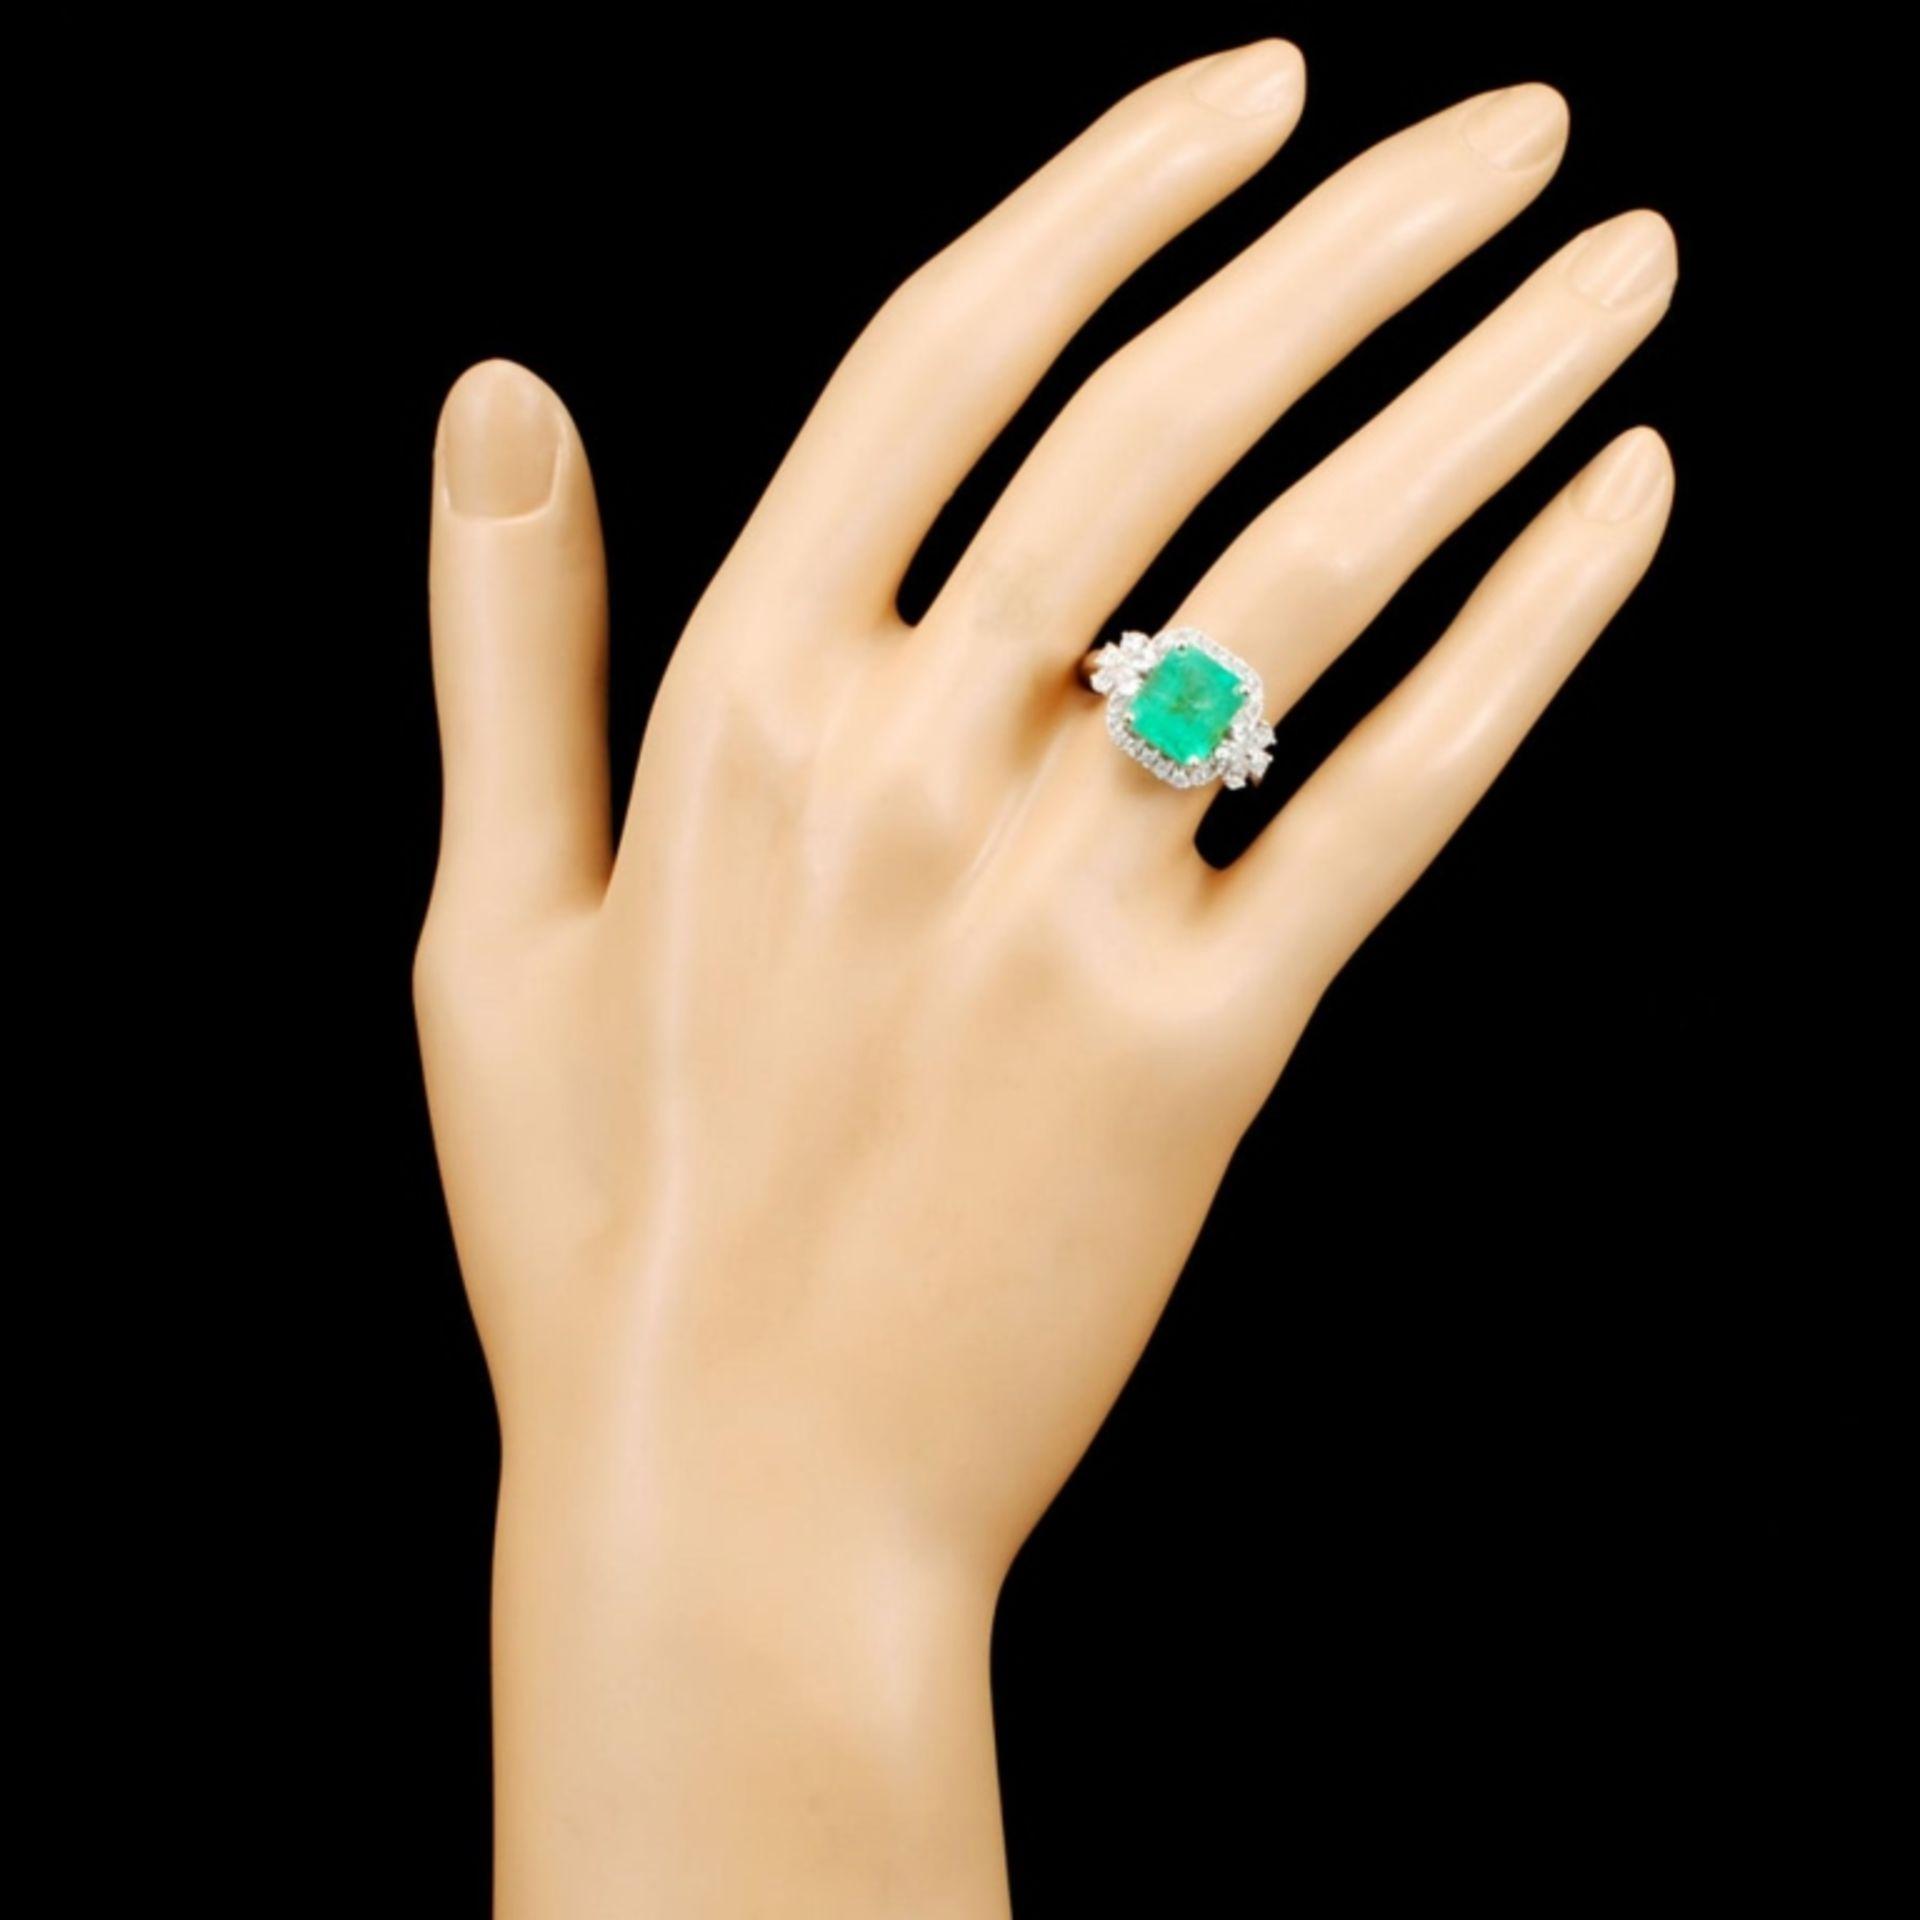 18K Gold 2.60ct Emerald & 0.77ctw Diamond Ring - Image 4 of 5